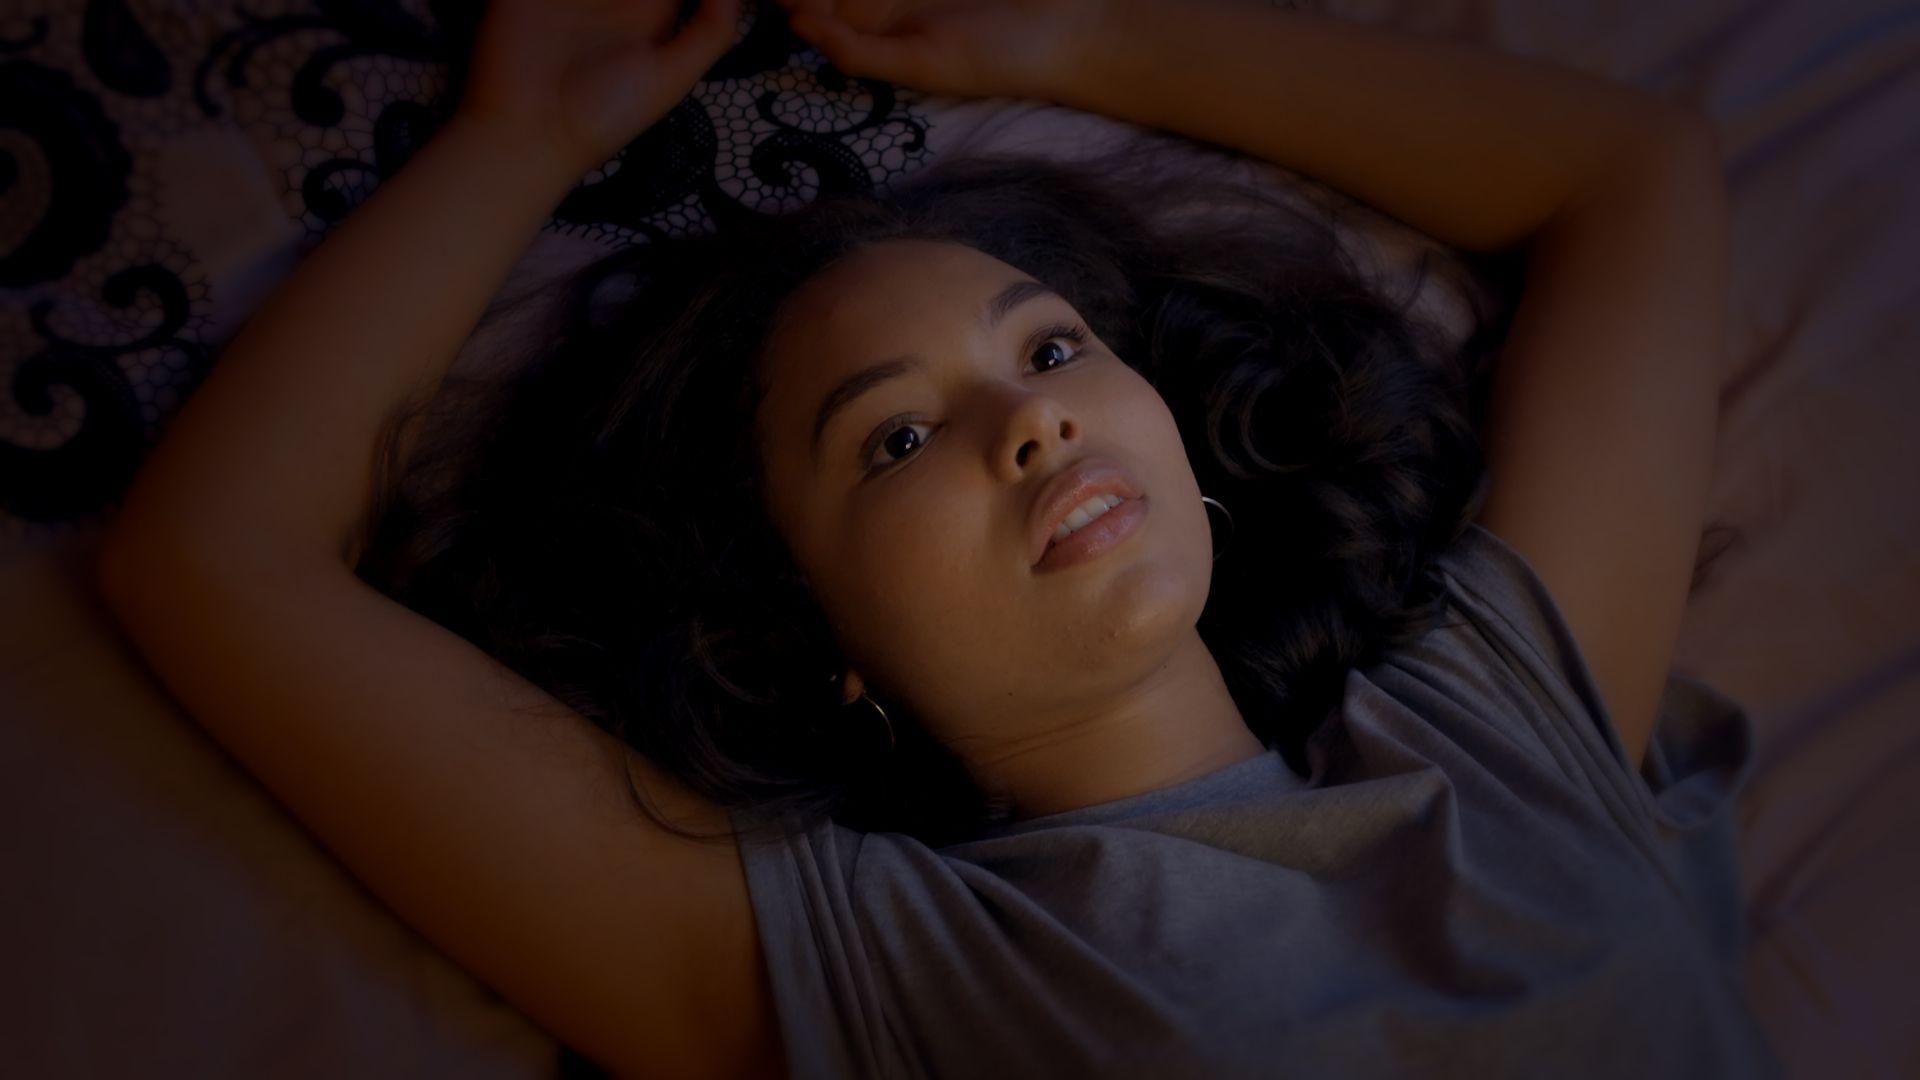 HONEYTRAP Still - Jessica Sula as Layla - Credit Luke Varley.jpg